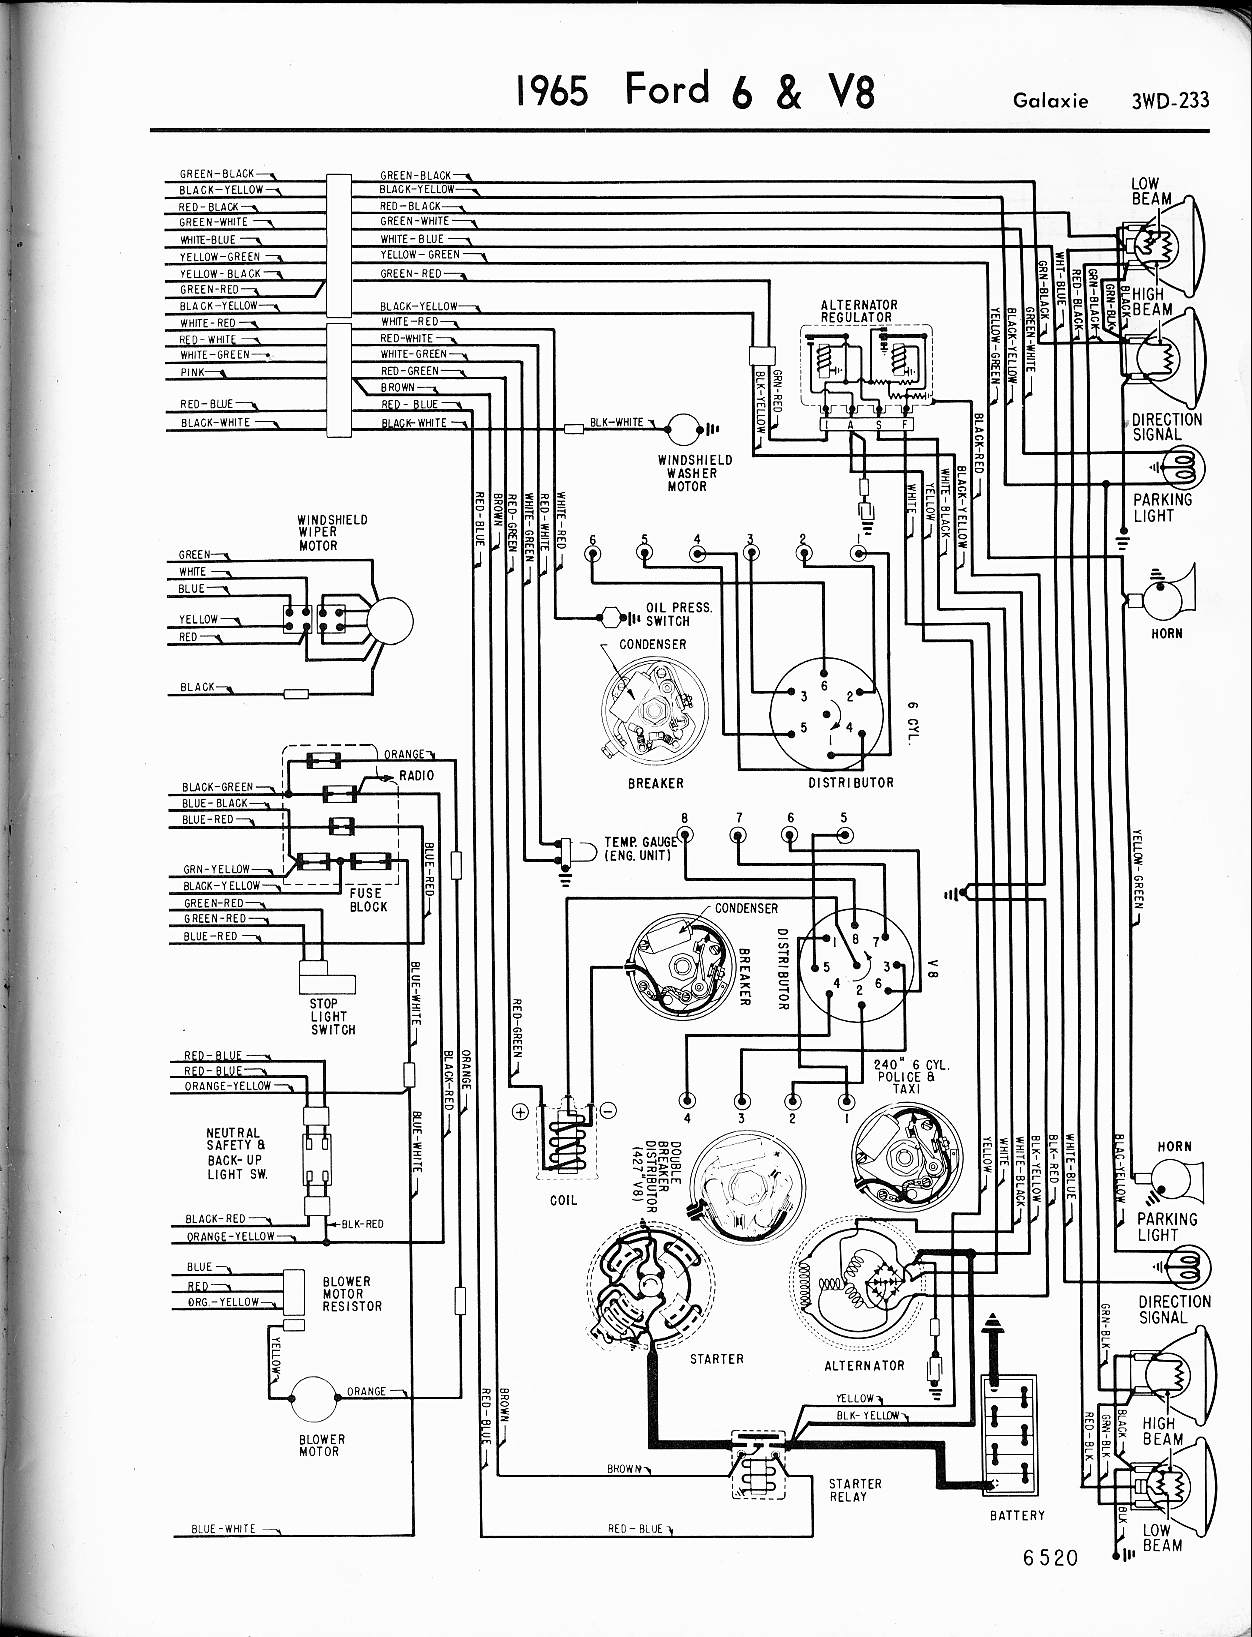 [SCHEMATICS_48DE]  WH_8215] 1998 Dodge Truck Wiring Diagram Http Wwwjustanswercom Classiccars   1966 Dodge Truck Wiring Diagram      Rdona Nful Dome Lite Kicep Sianu Emba Mohammedshrine Librar Wiring 101